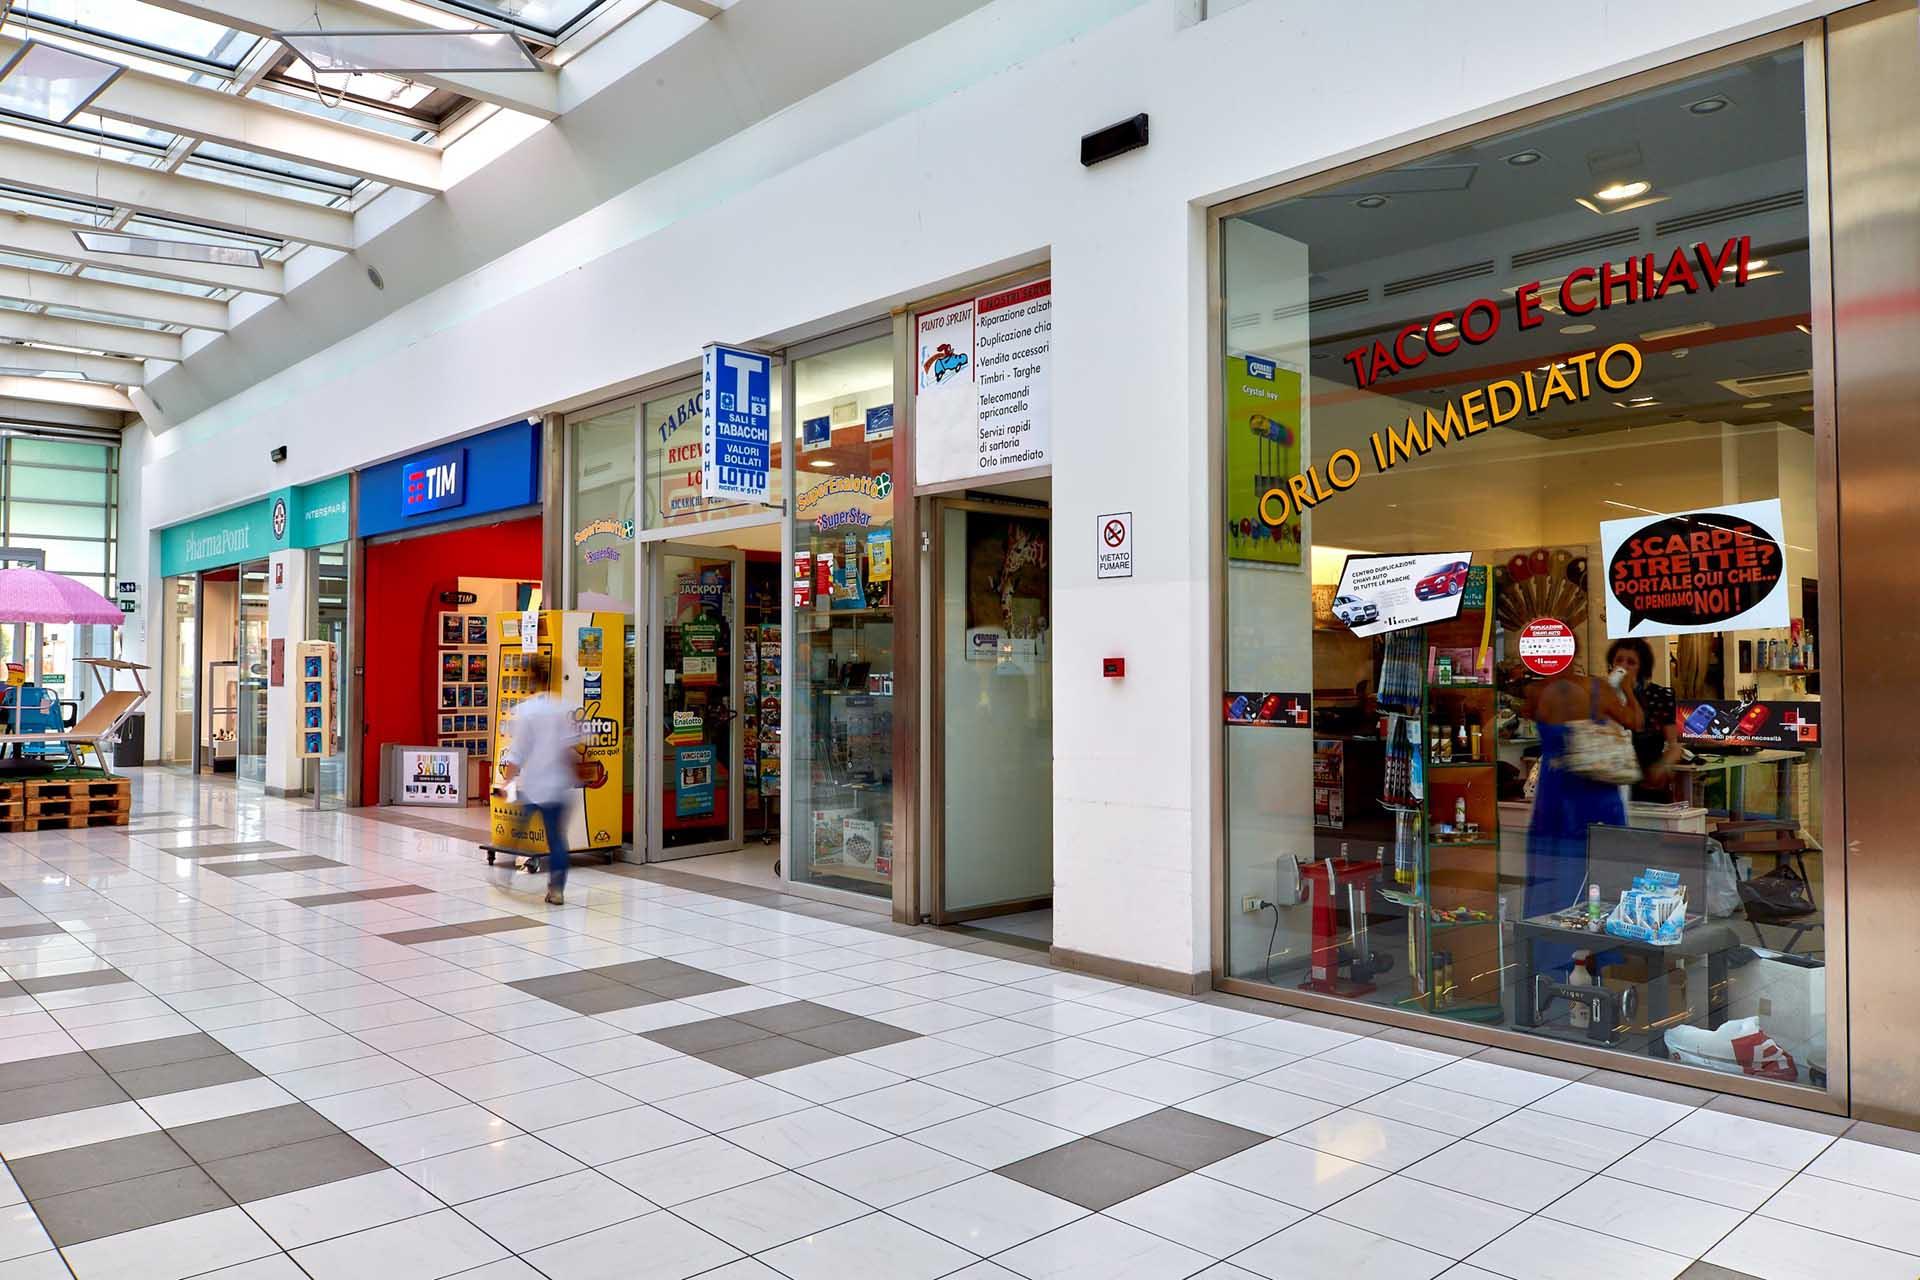 Tabaccheria, Centro Tim e Pharmapoint al Centro Commerciale Extense